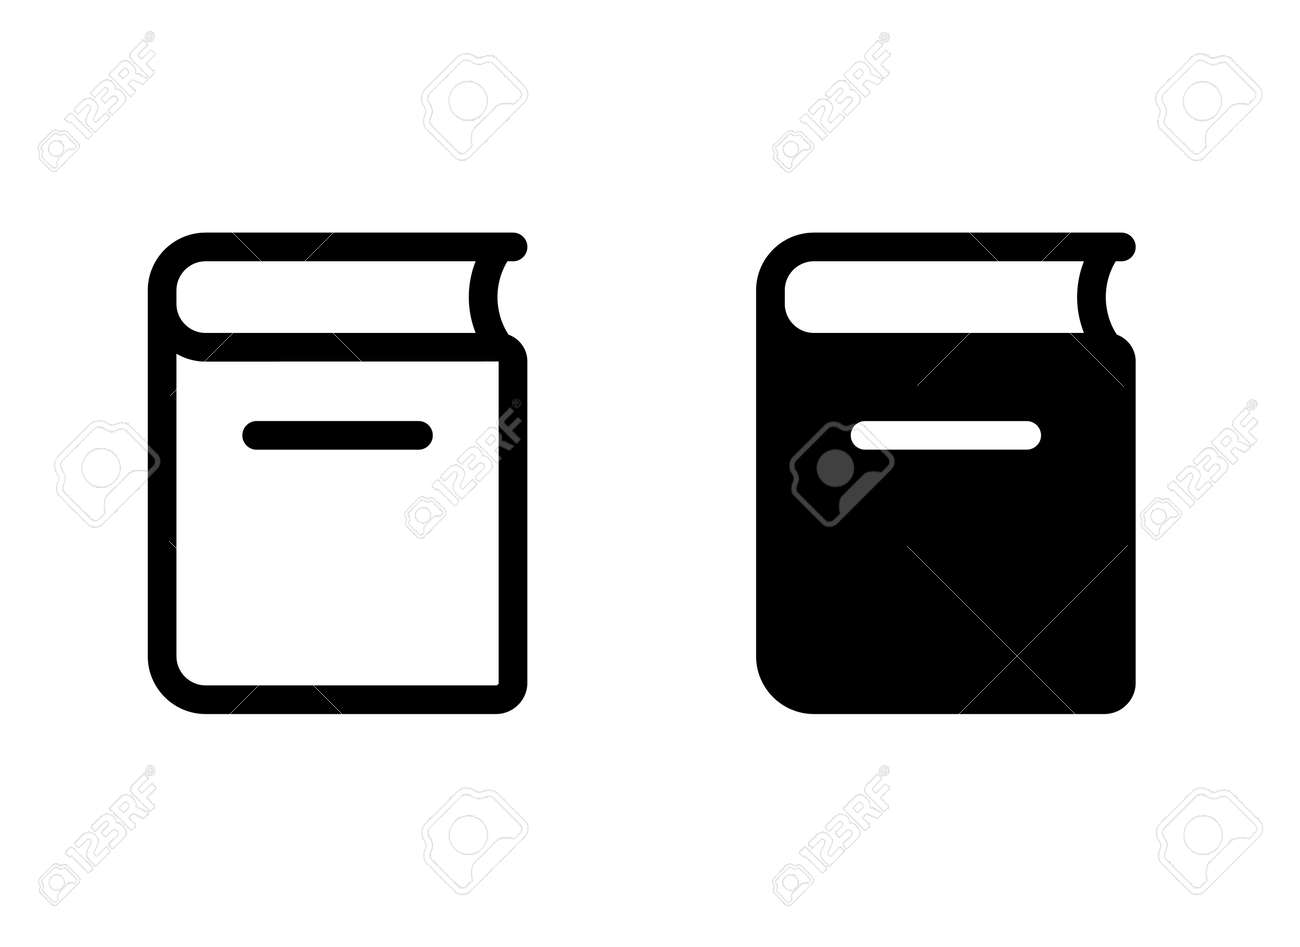 Thick book vector icon set - 170366971